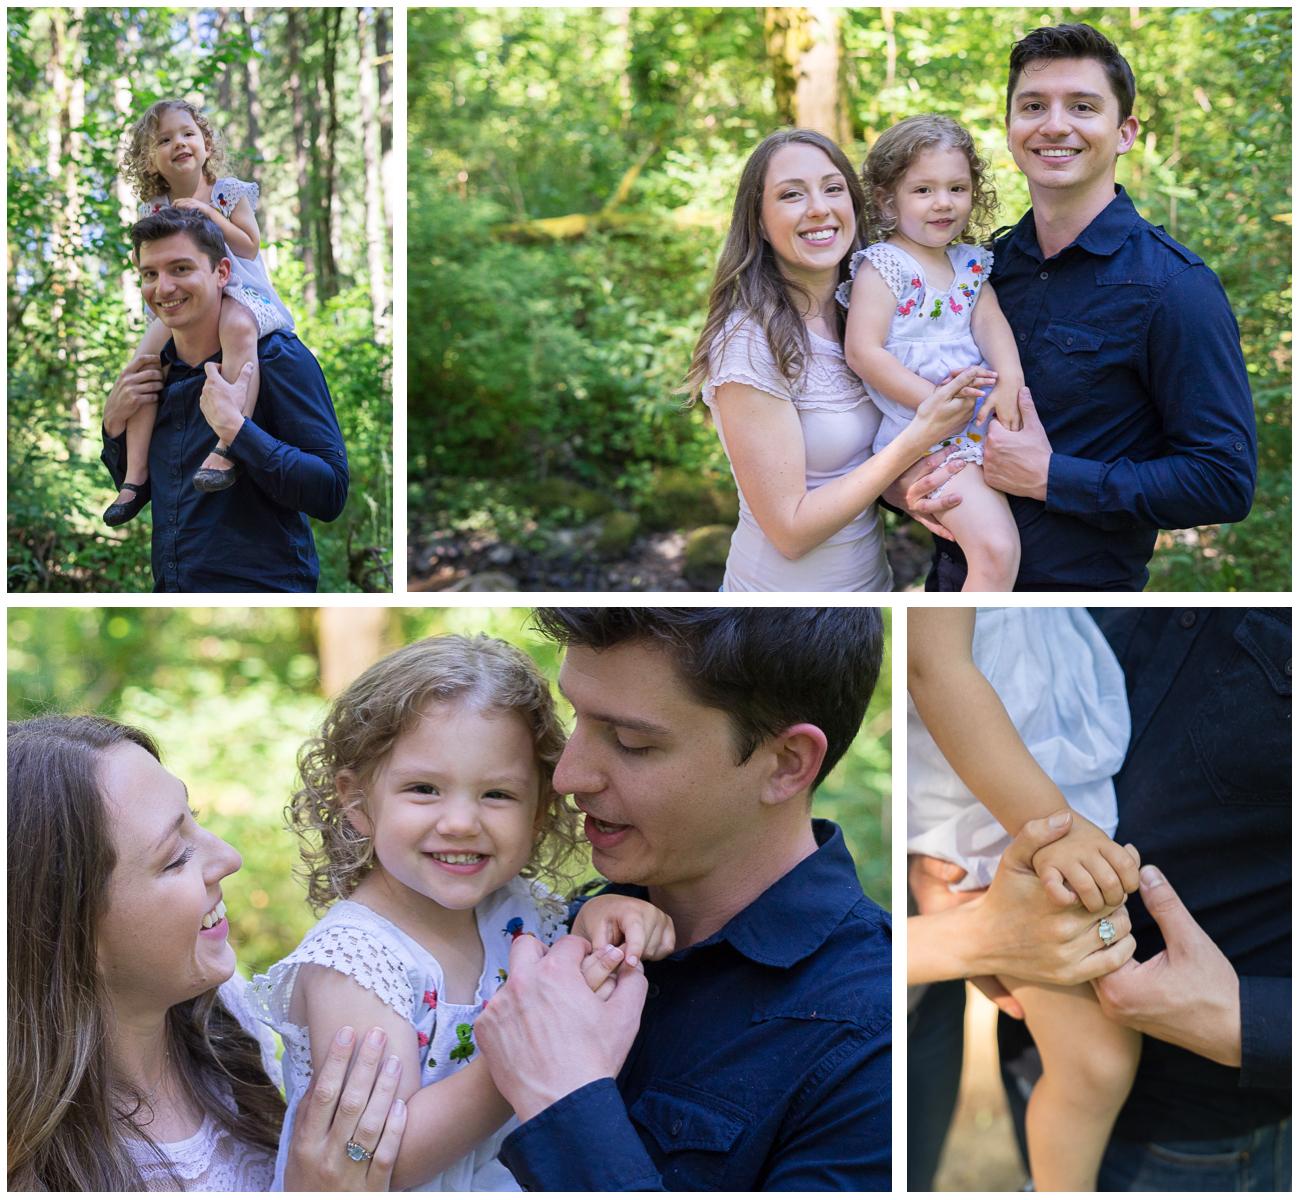 Portland Lifestyle Family Photographer